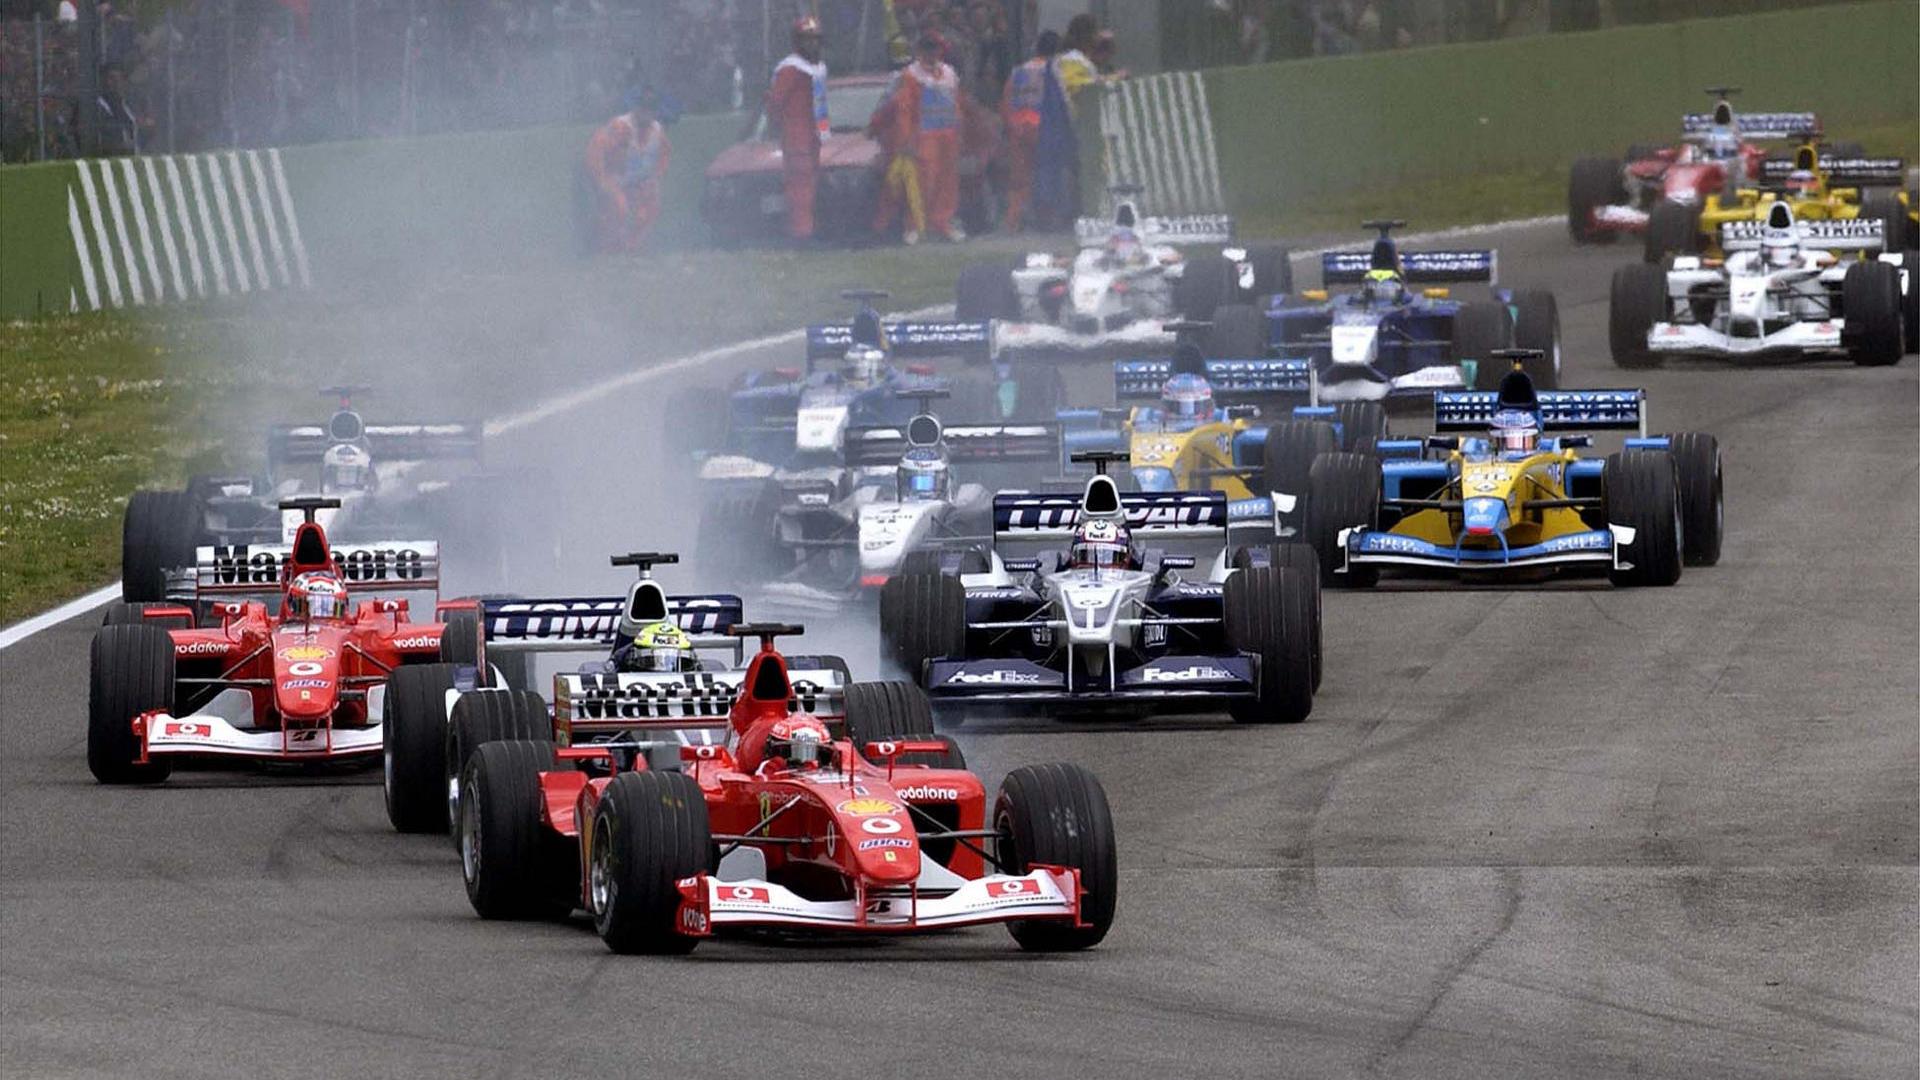 Hd Wallpapers 2002 Formula 1 Grand Prix Of San Marino F1